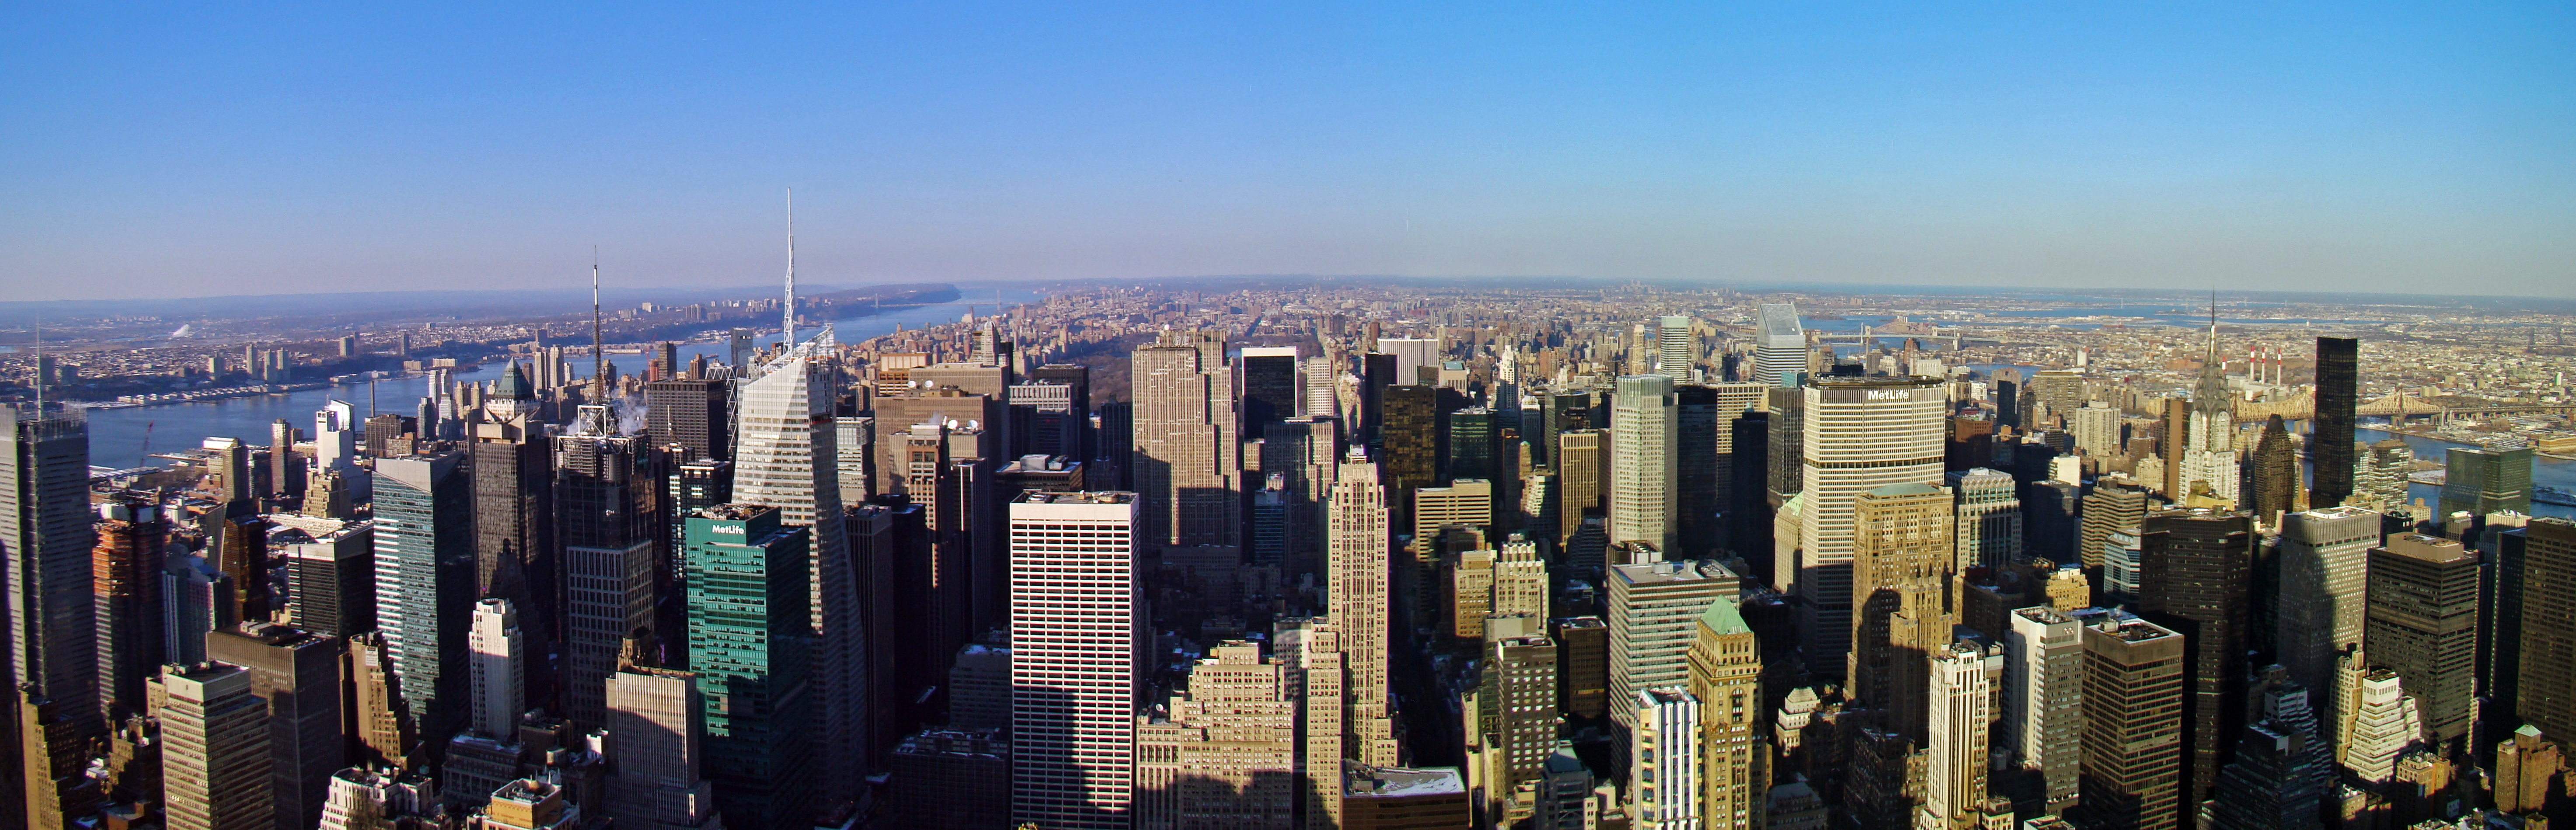 new york city – wikipedia